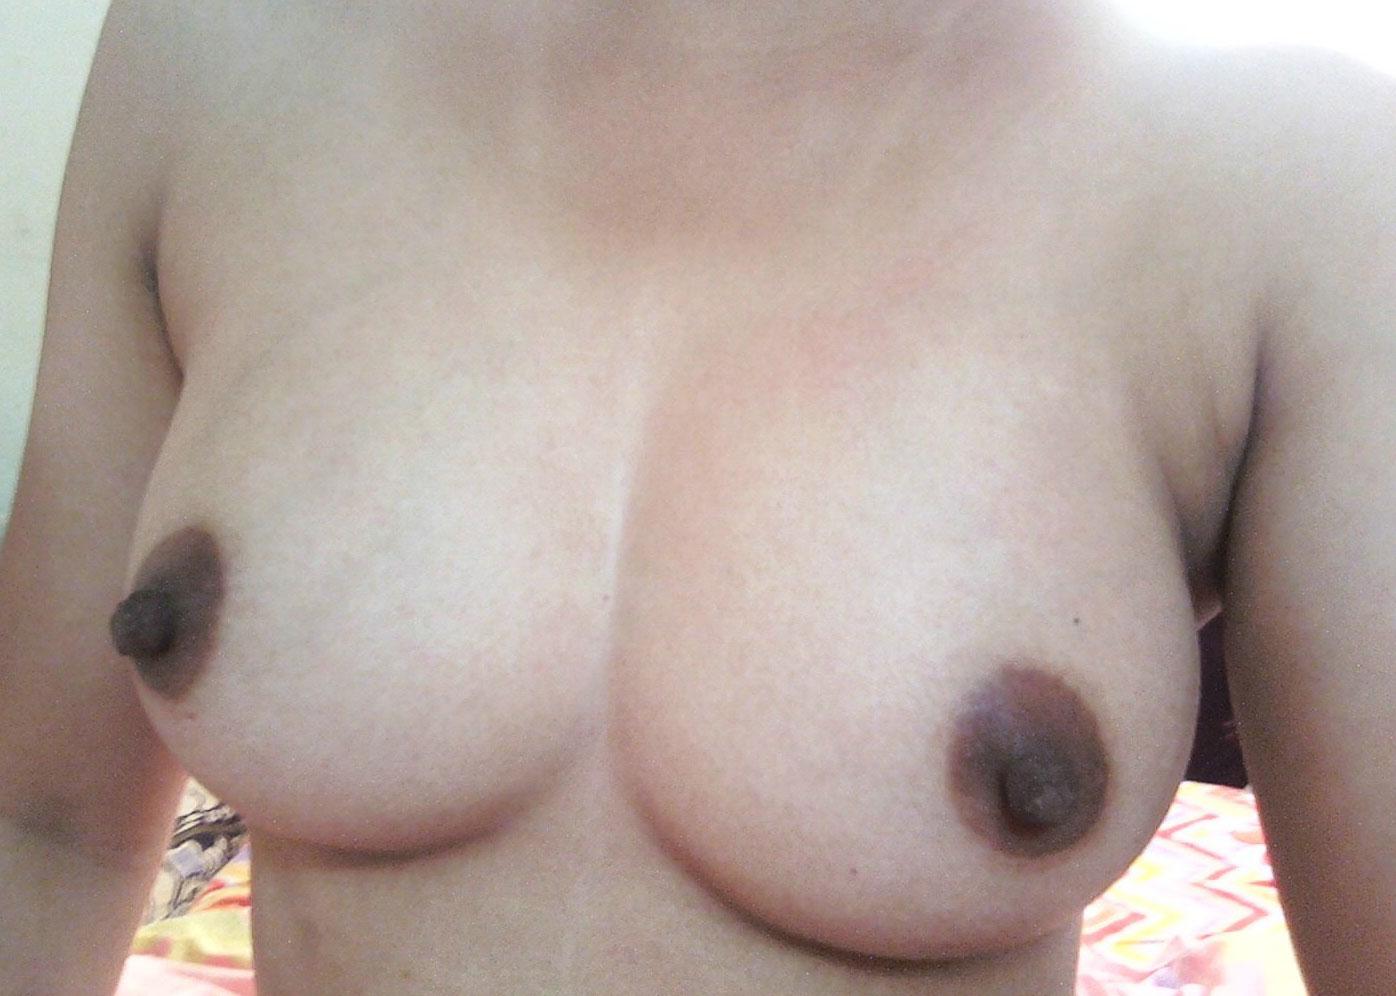 Curvy Full Nude Jaipur Hotties Arousing Amateur Photos ...